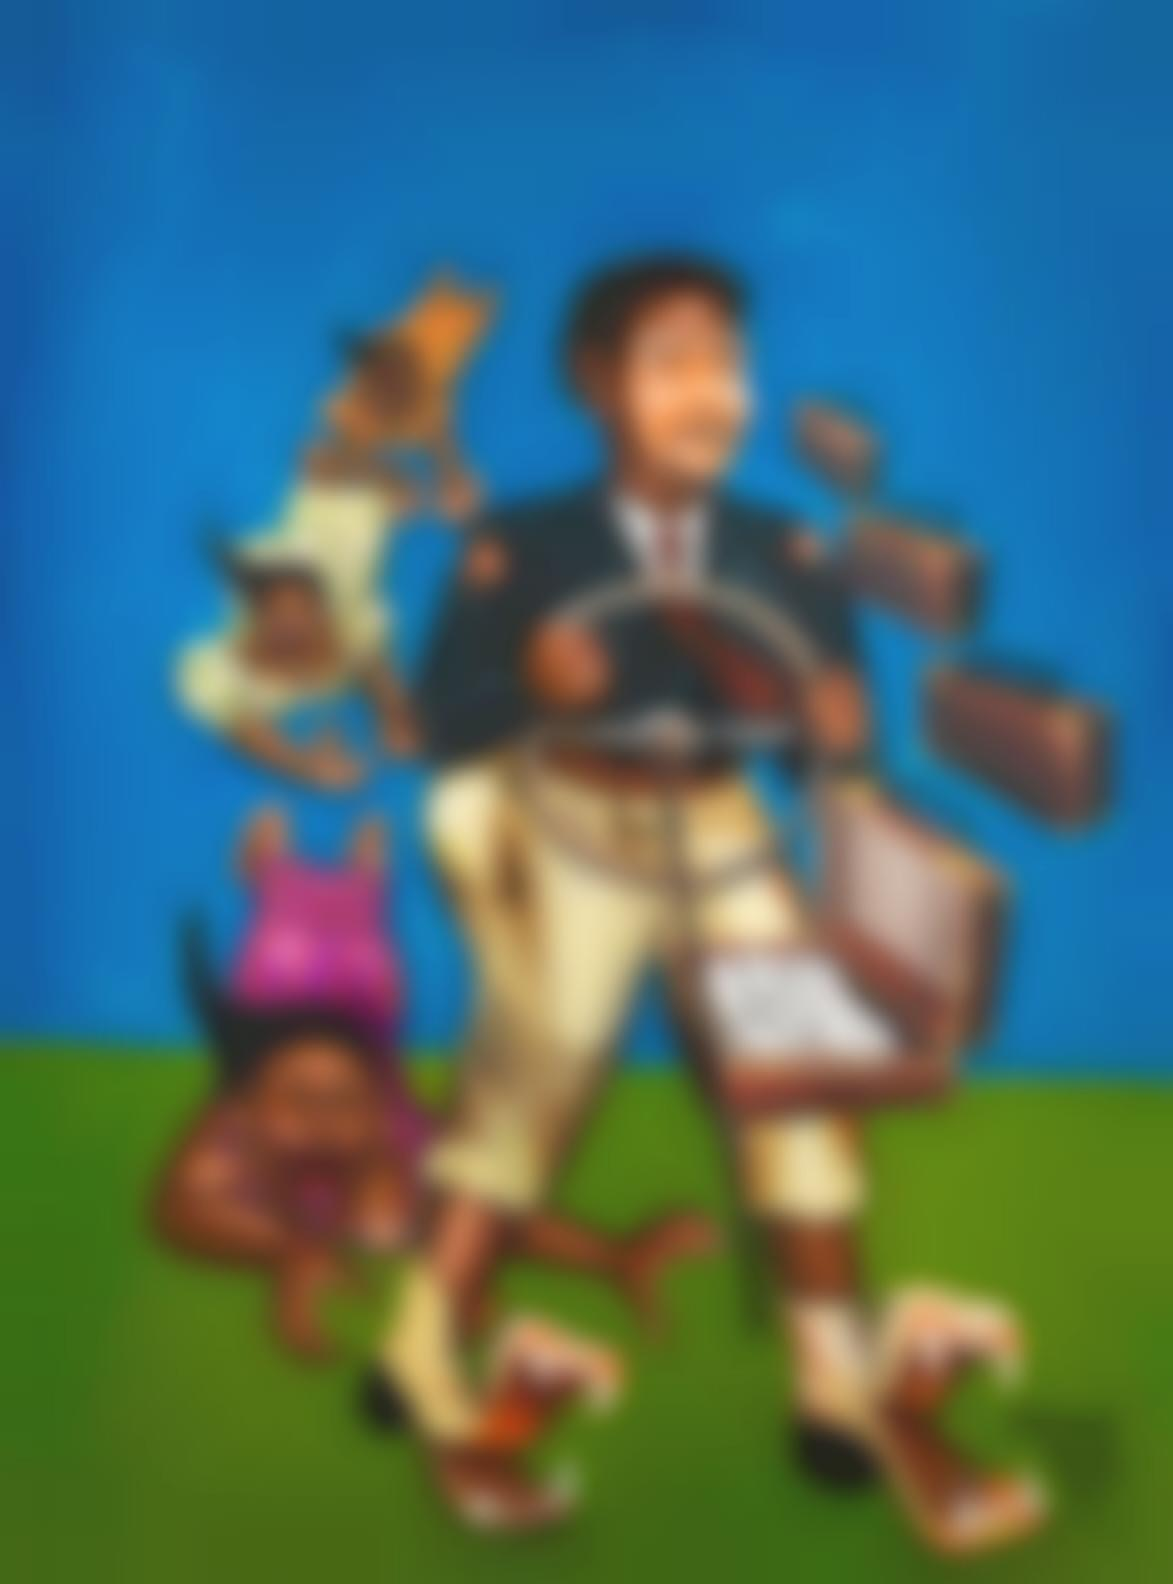 Monsengwo Kejwamfi 'Moke' - Moke Na Pas De Largent (Moke Doesnt Have Any Money)-